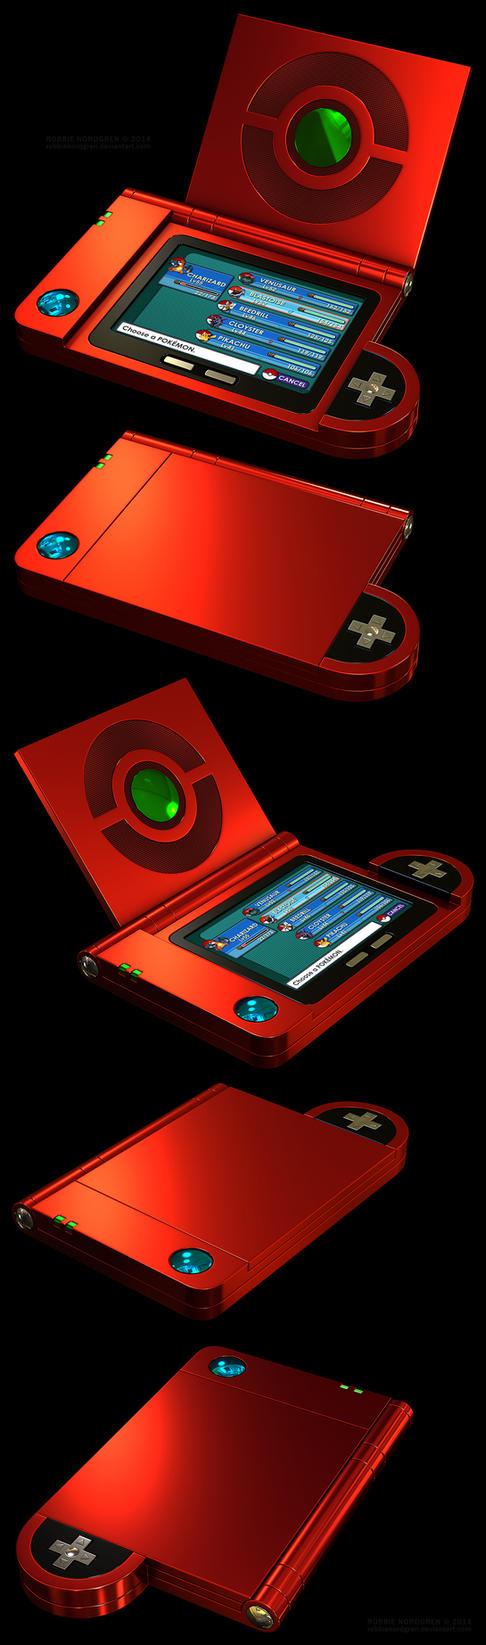 Kanto Pokedex 3D, 3rd Generation by robbienordgren